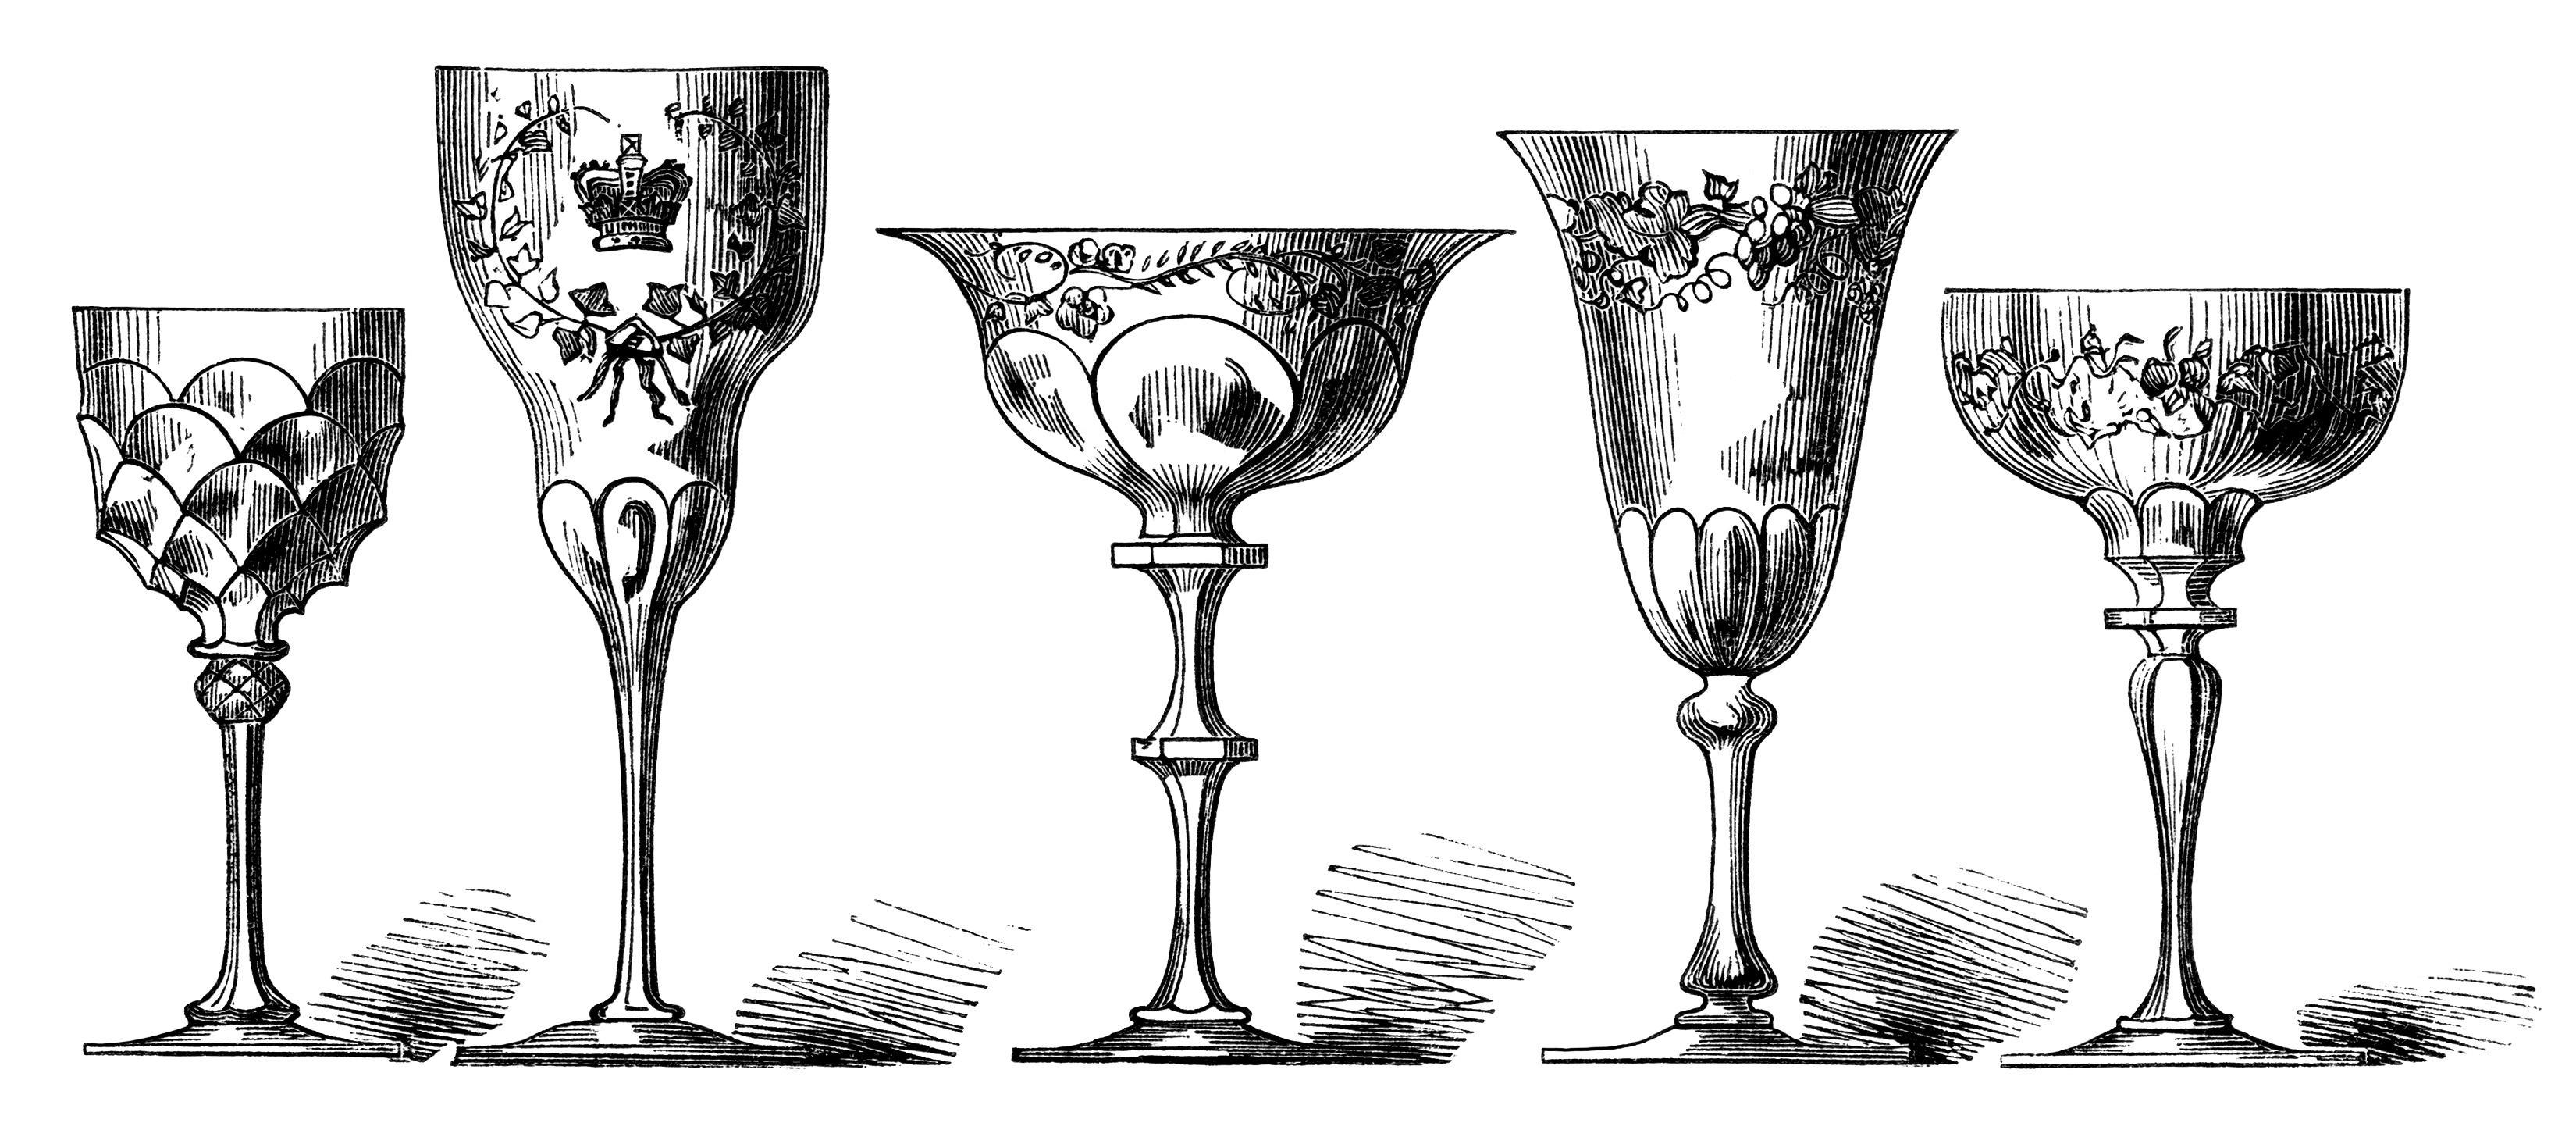 Engraving clipart glassware Glassmaking Glass History glassimo eu